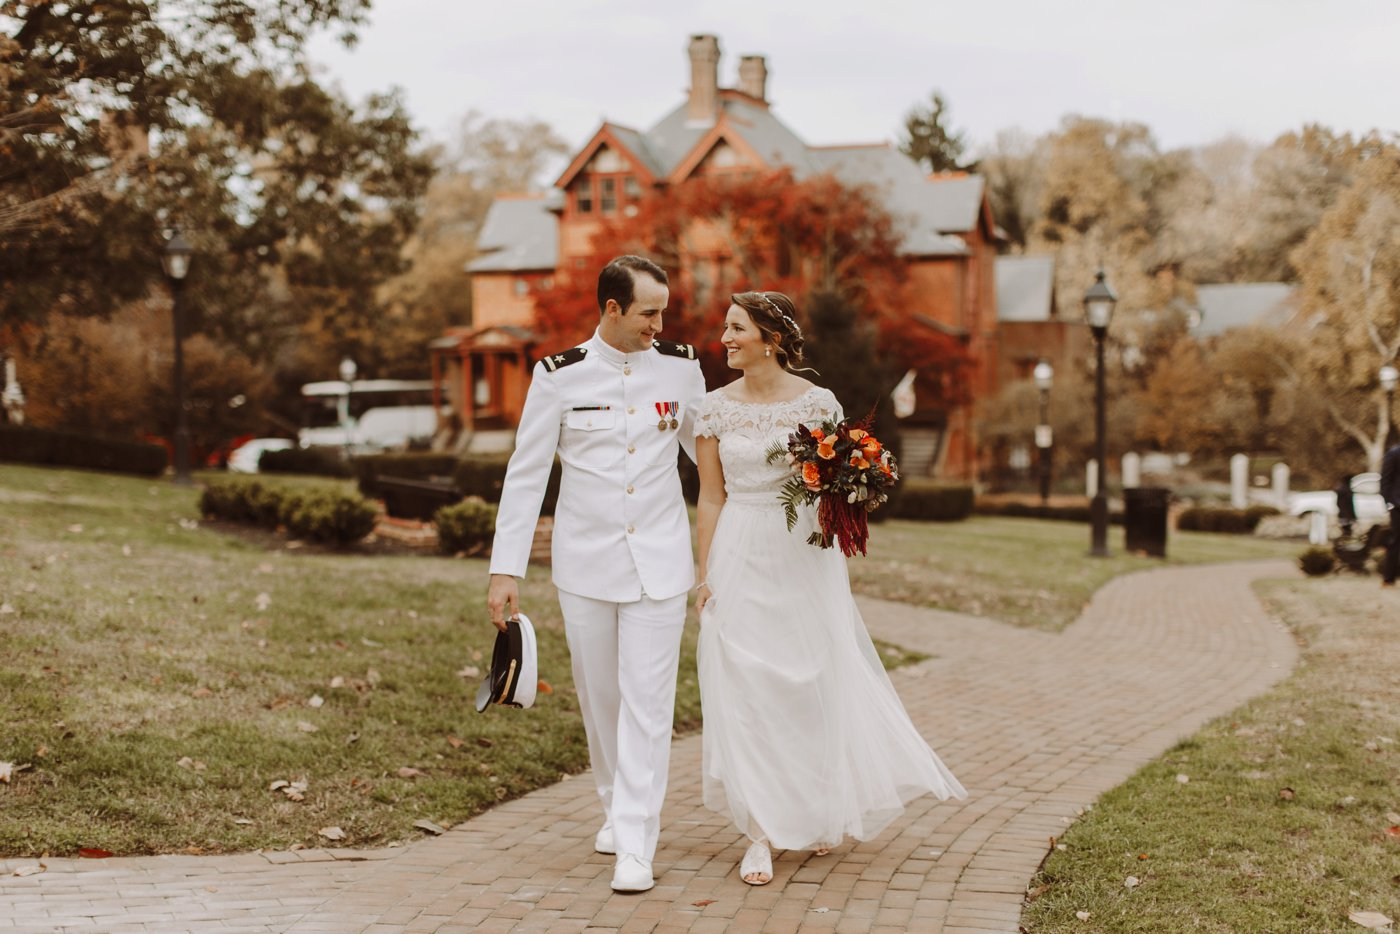 USNA wedding Annapolis Maryland bride and groom portraits Annapolis Maryland wedding photographer